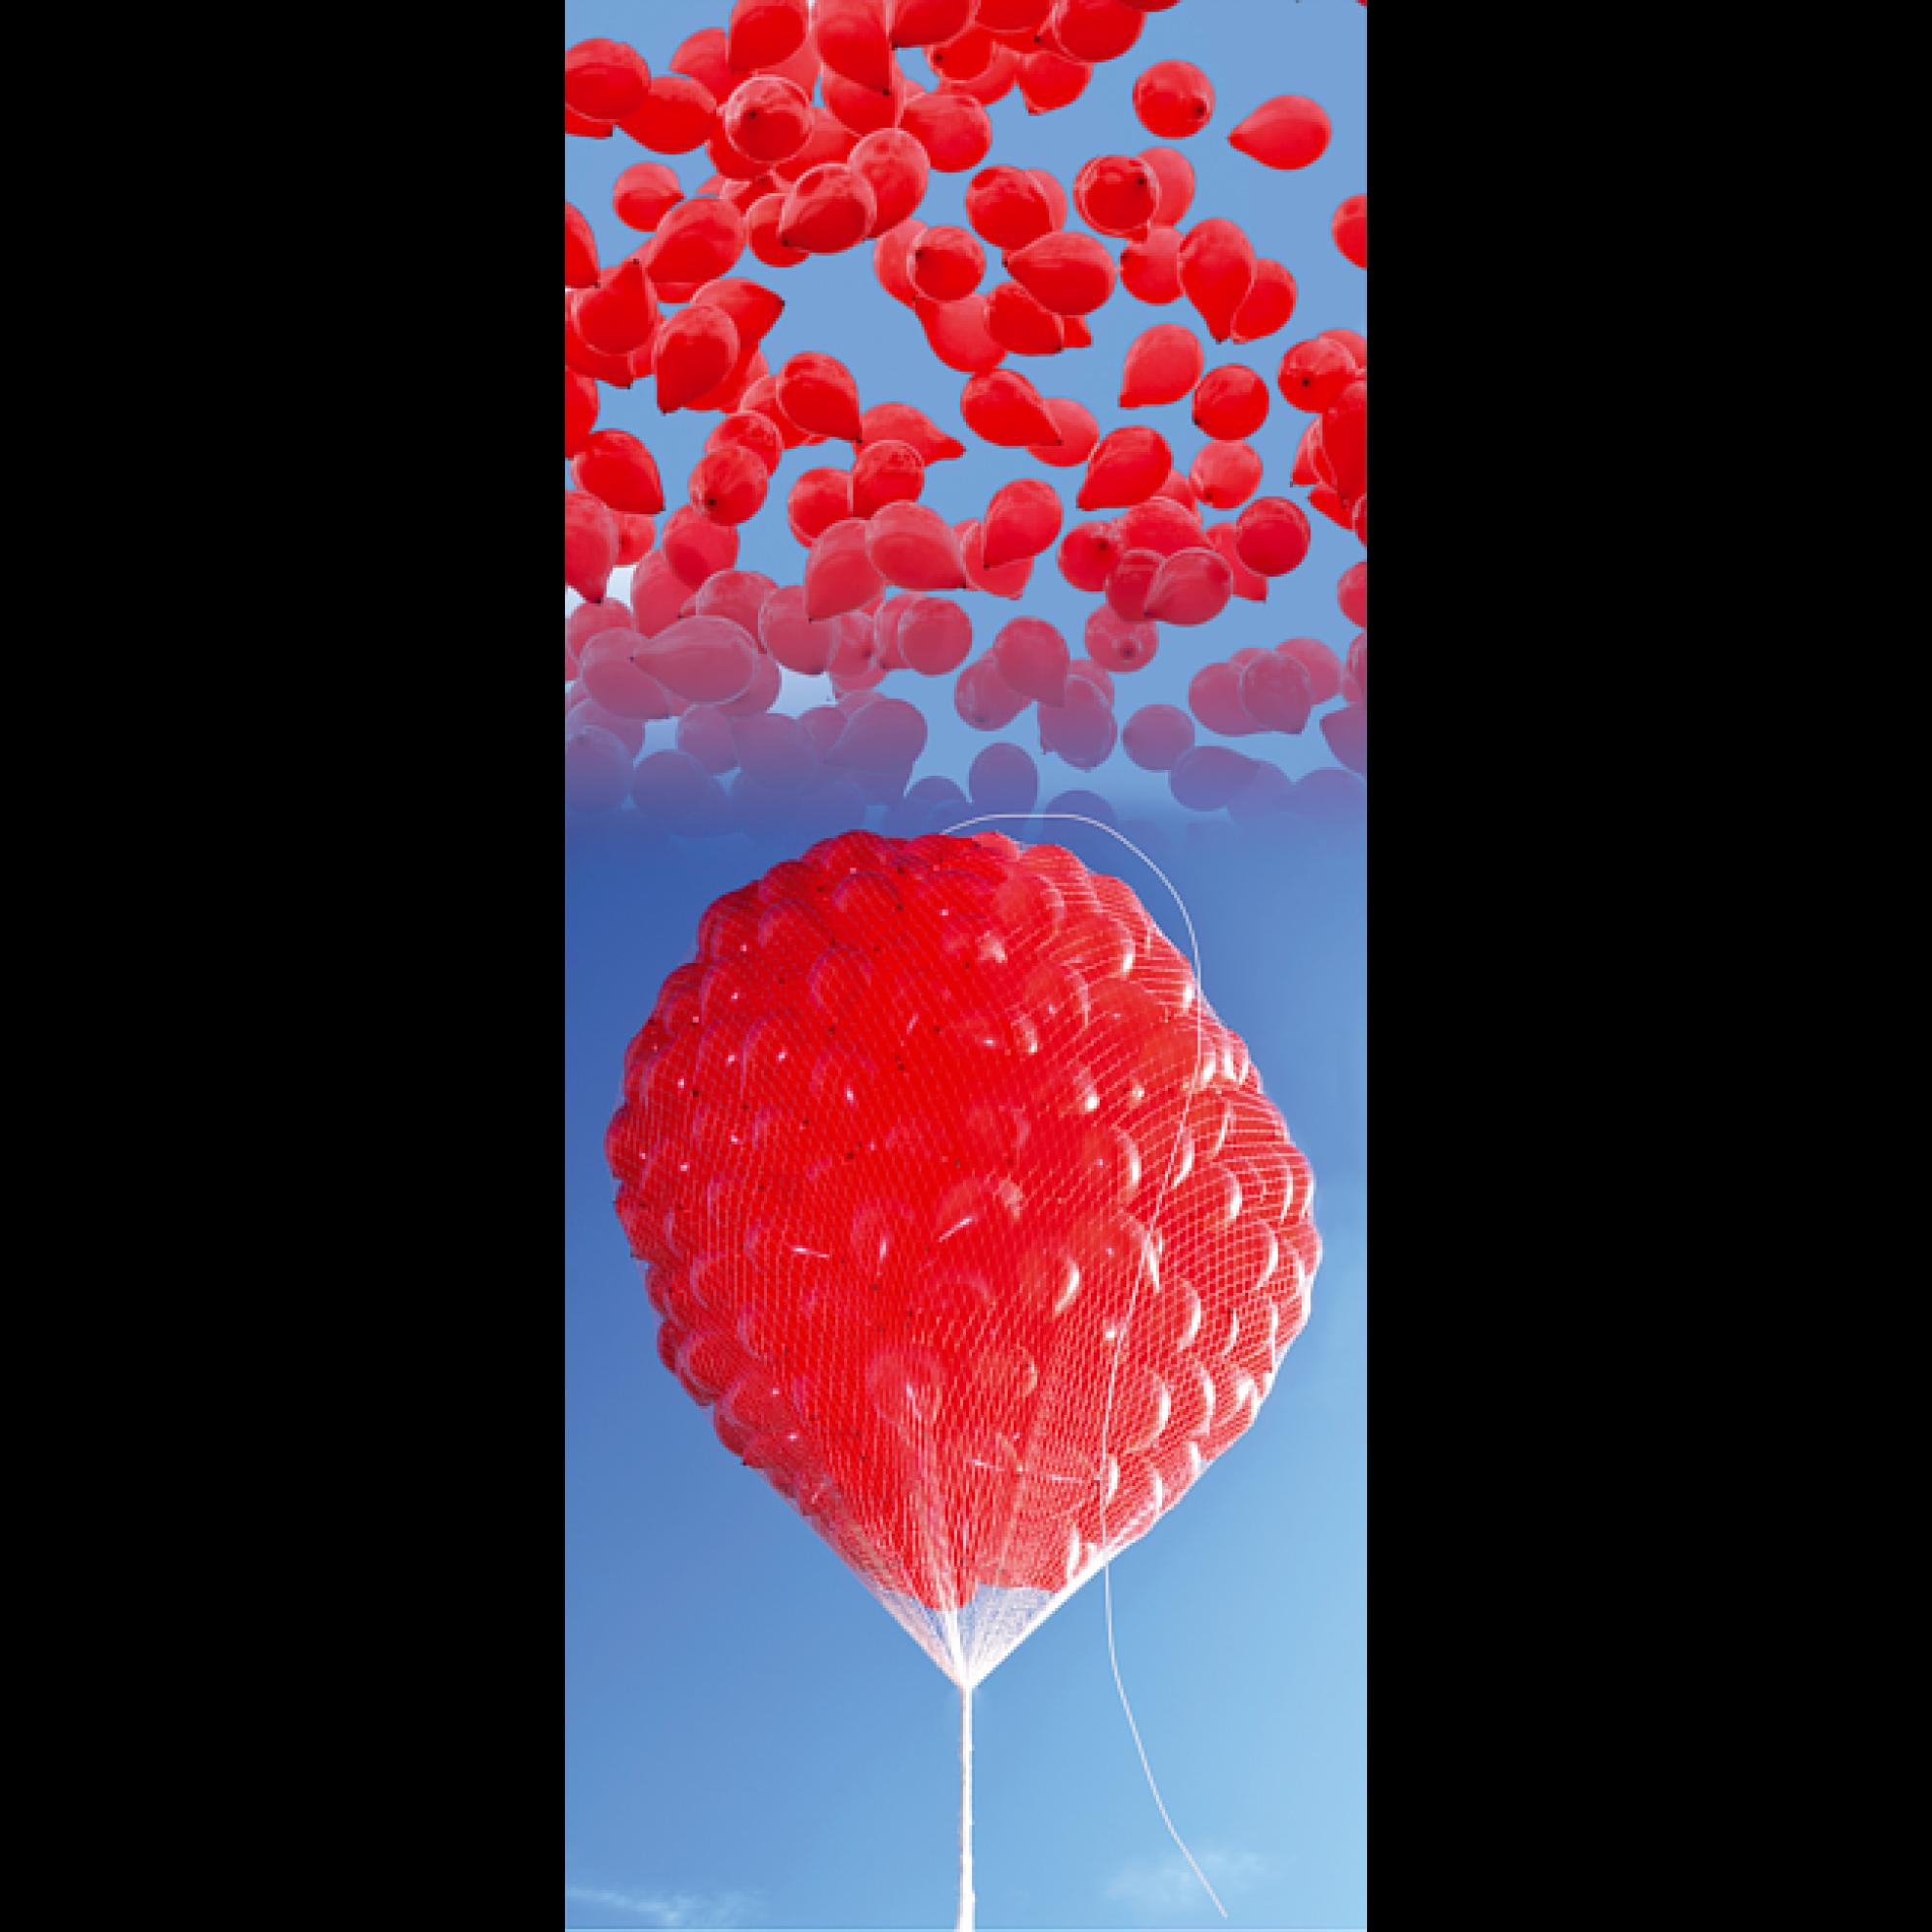 luftballonnetz massenstartnetz f r bis zu 1000 luftballons. Black Bedroom Furniture Sets. Home Design Ideas